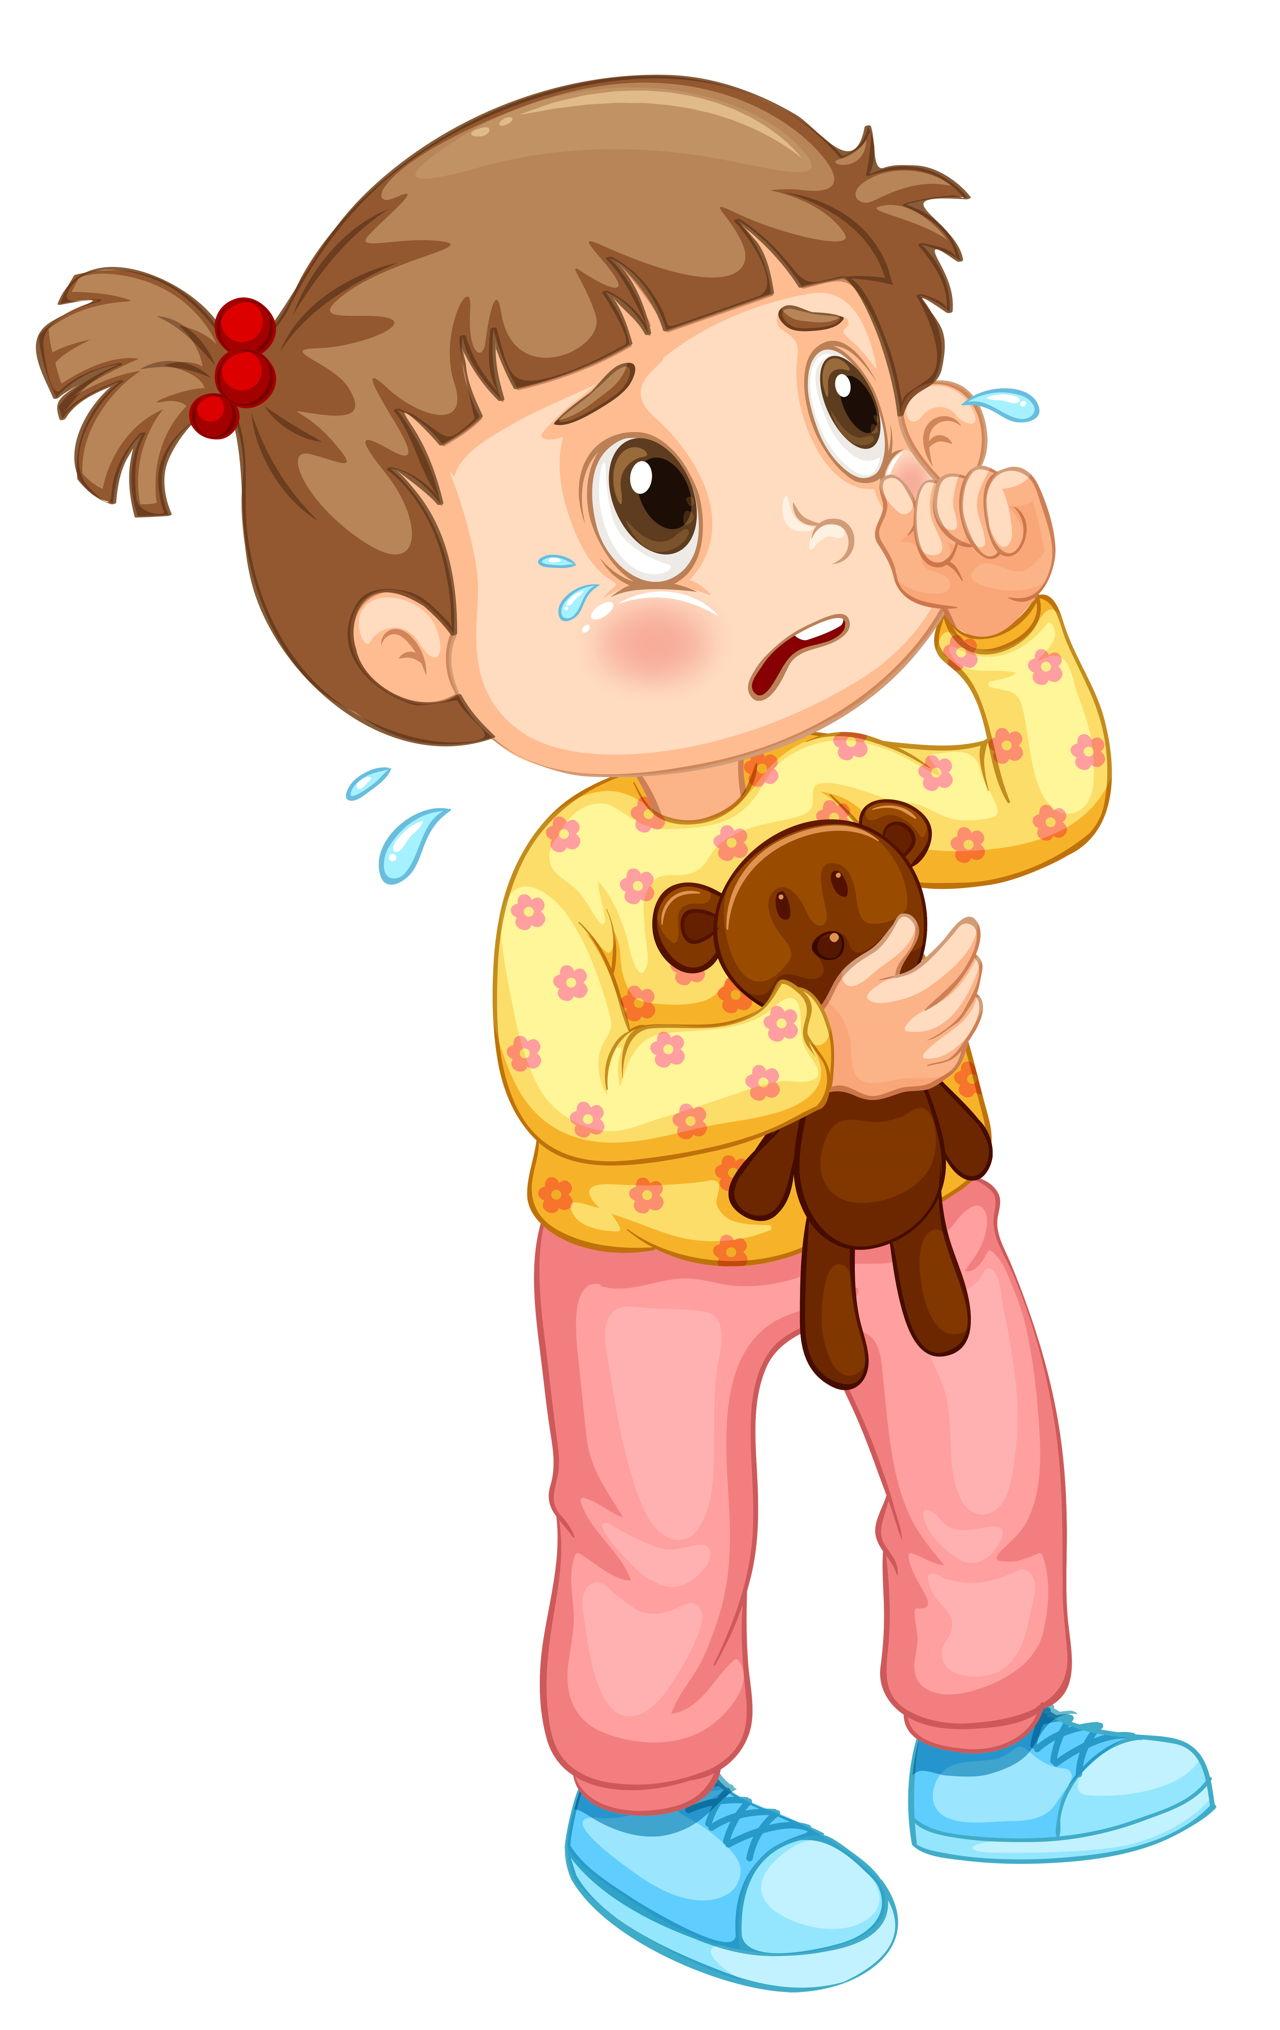 Chronic Constipation in Children